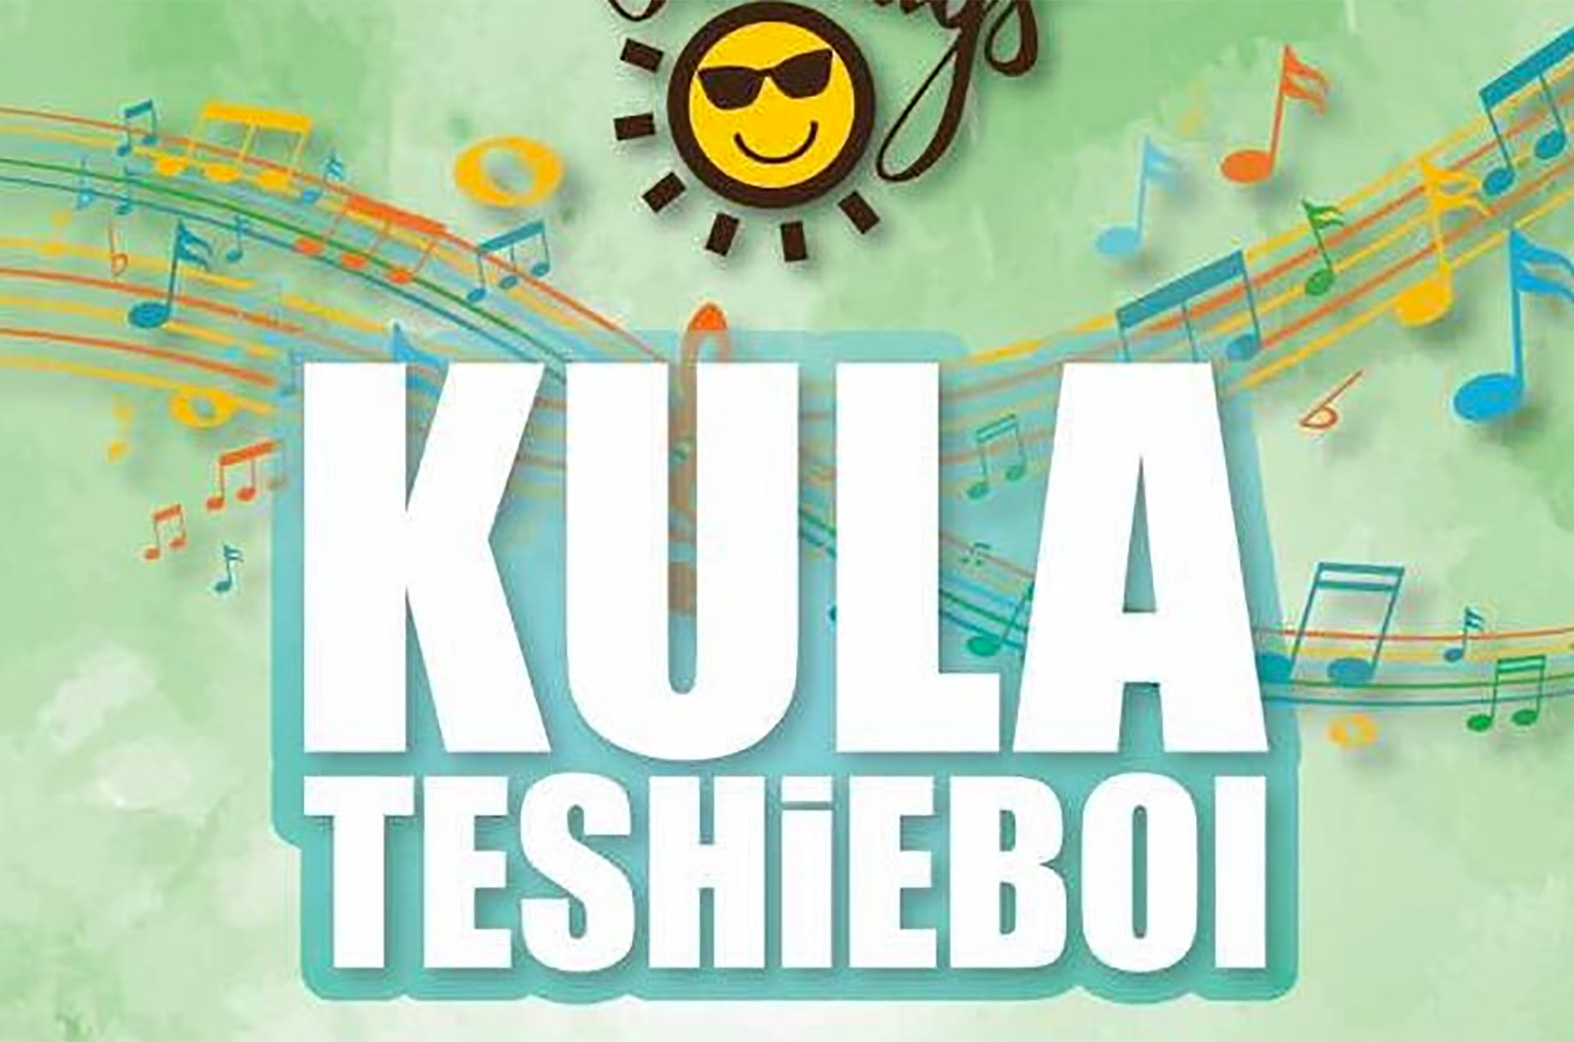 Serallio Sundays with Kula & Teshie Boi